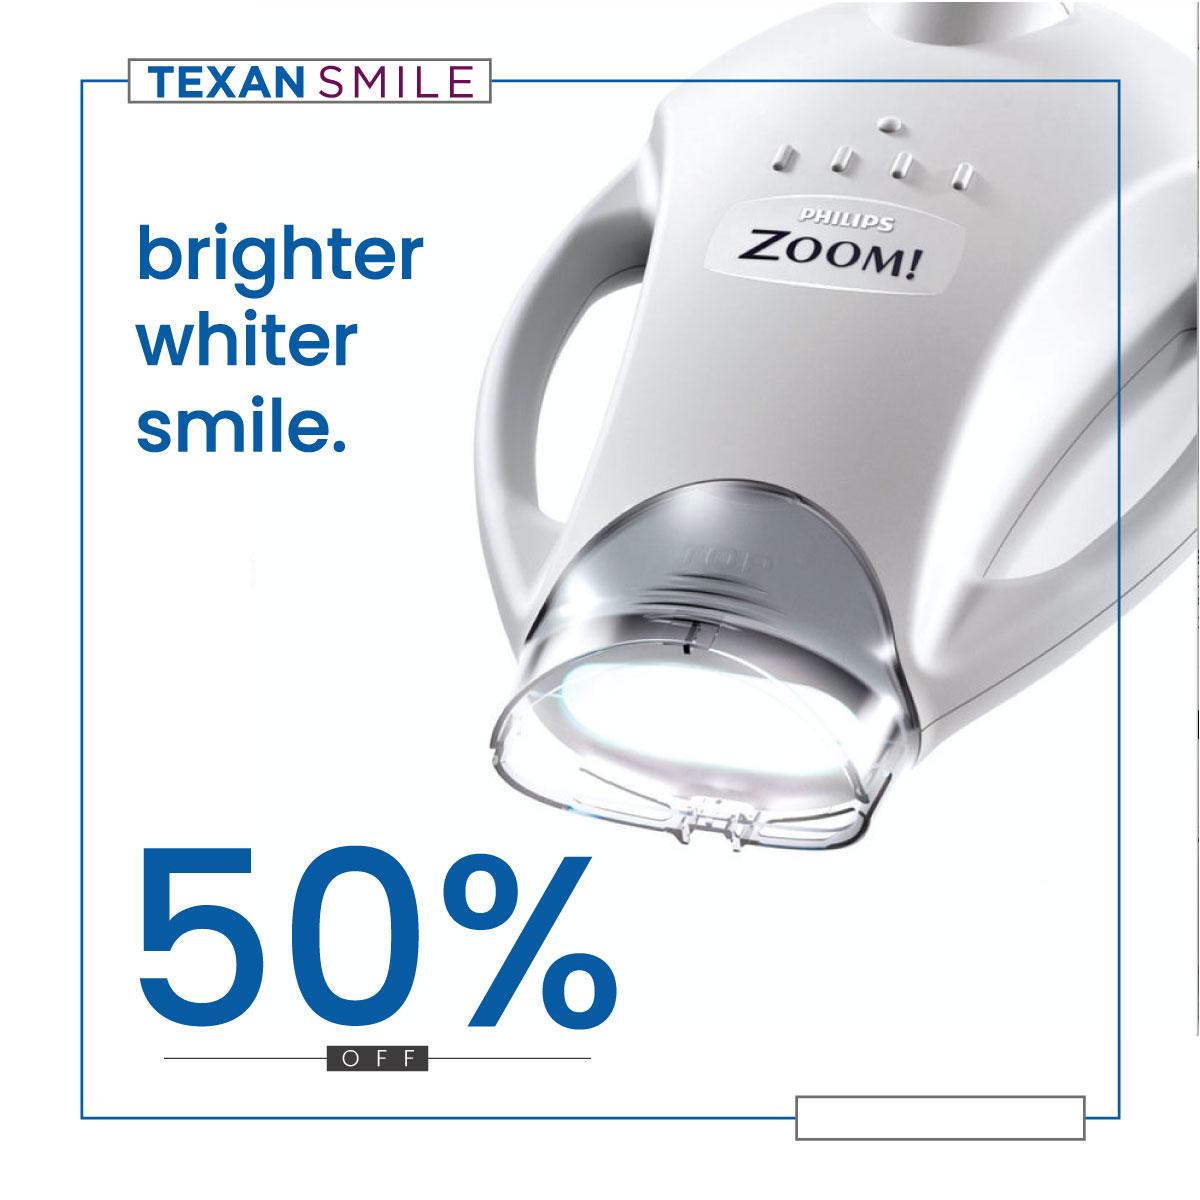 Texan Smile Sugar Land Dentist 77479 Zoom Half Off